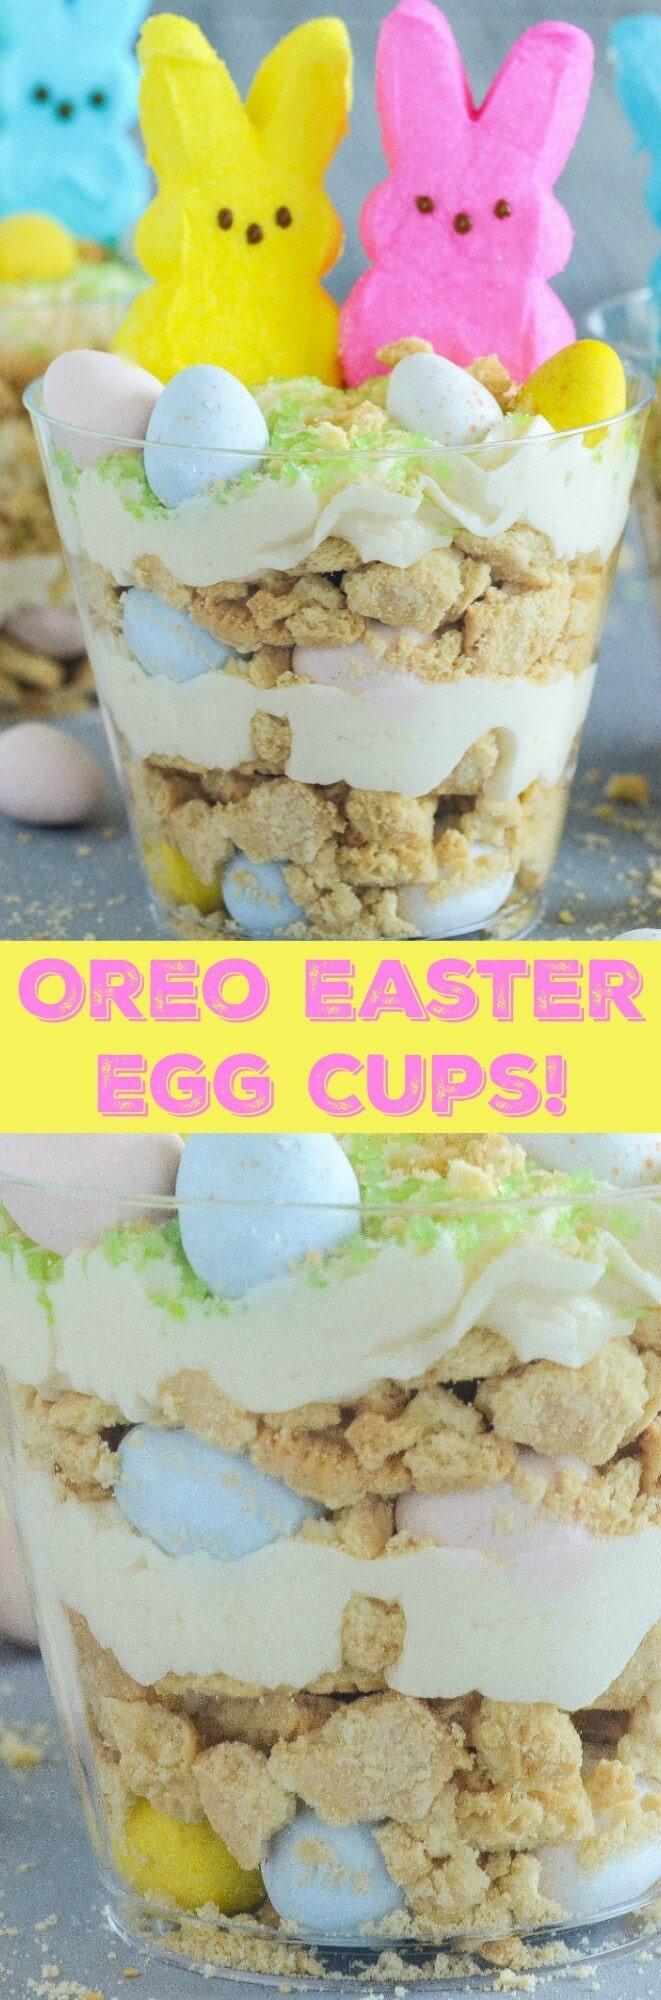 Oreo Easter Egg Cups - crushed vanilla oreos are layered with oreo cream filling buttercream and mini cadbury eggs!